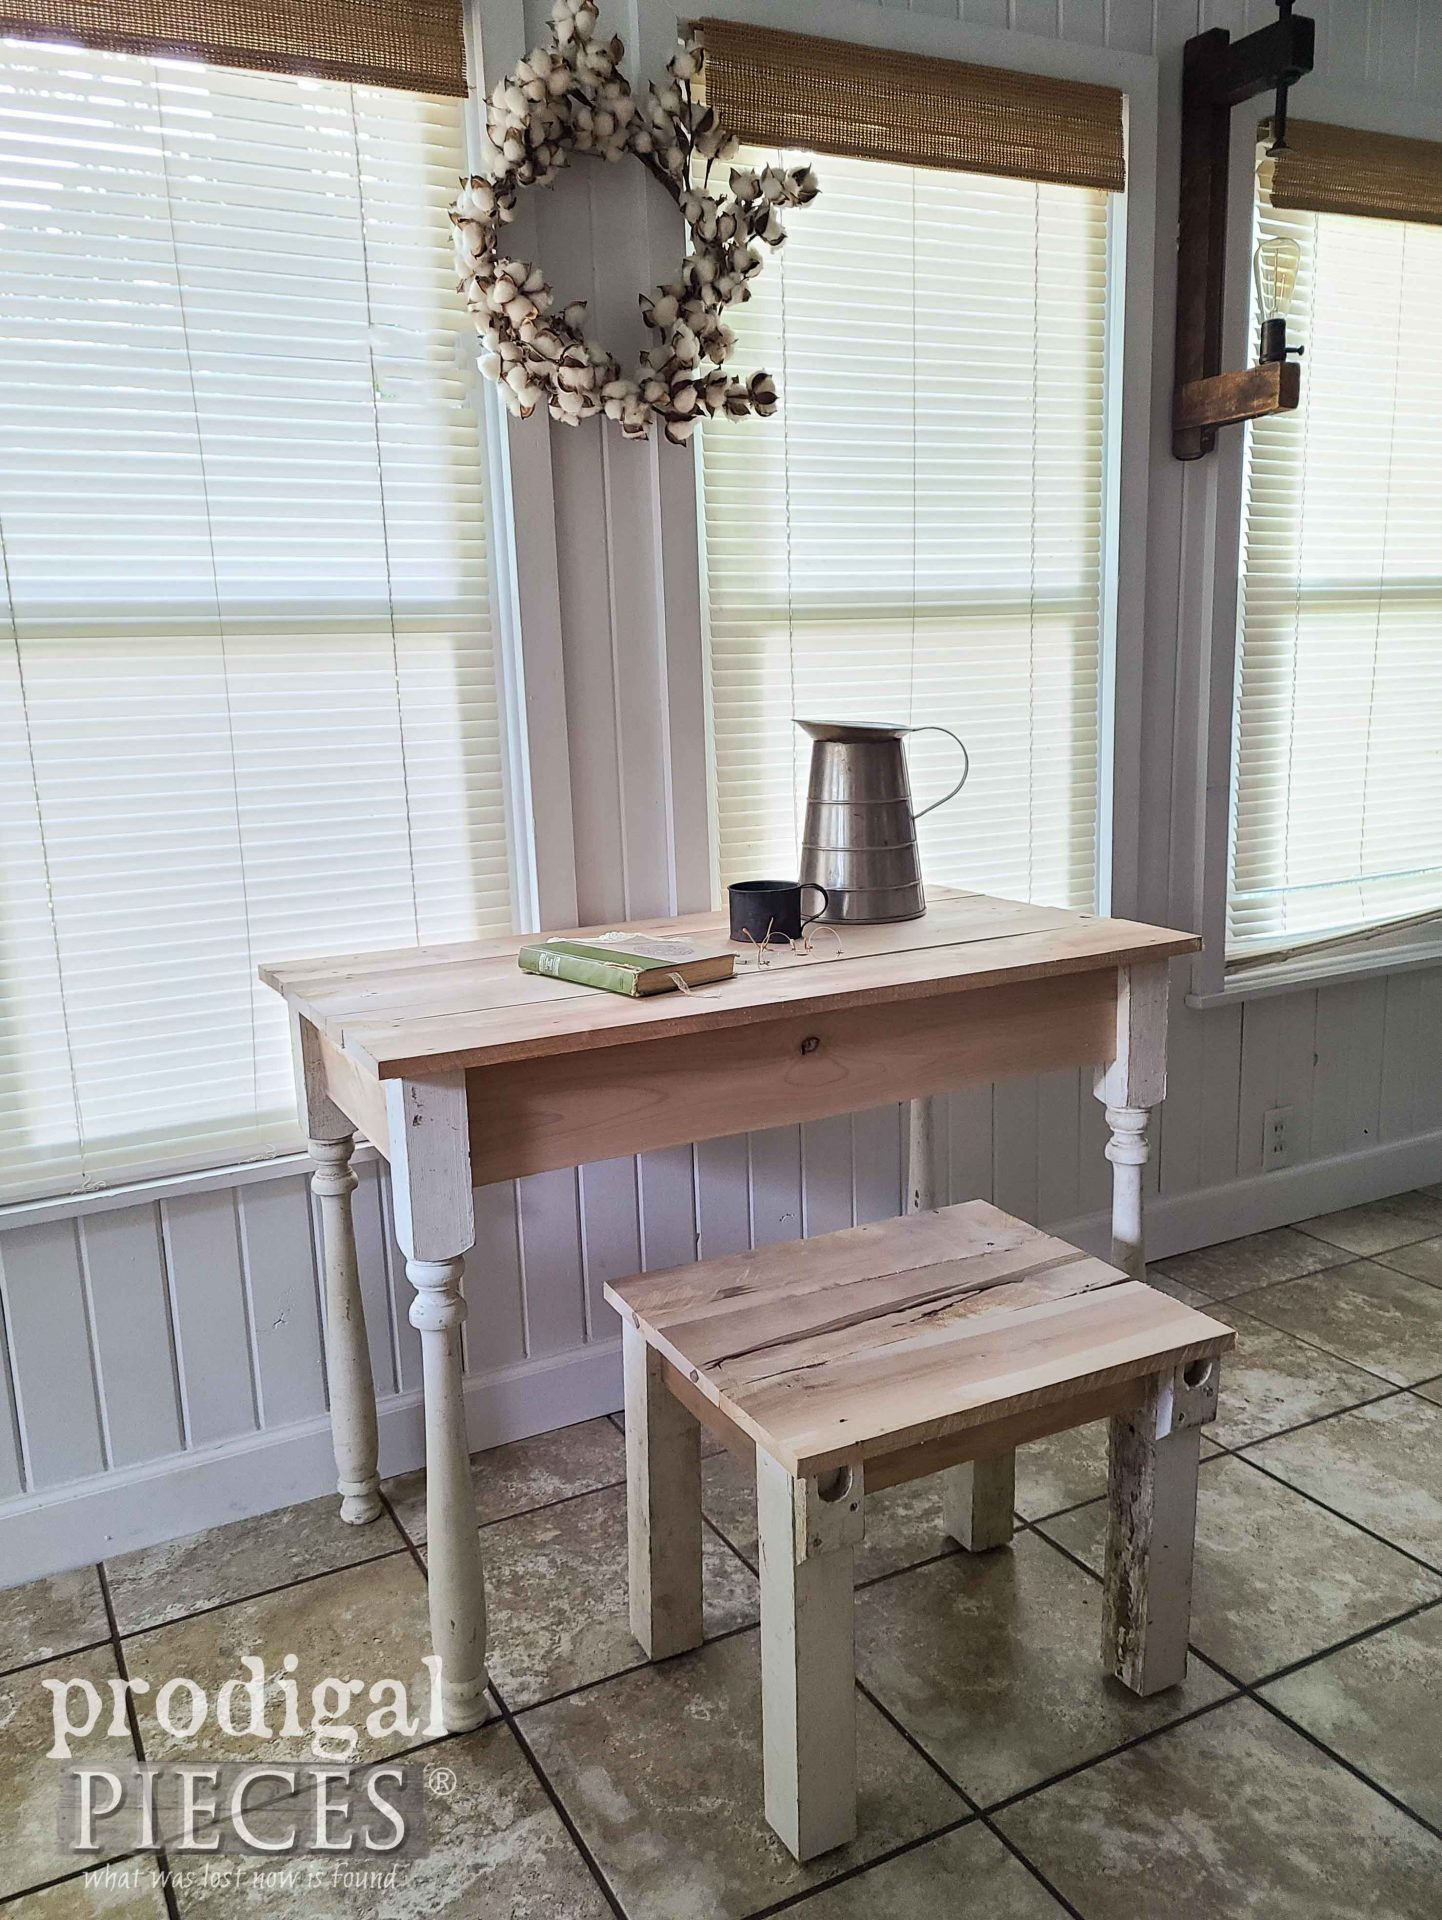 Reclaimed Farmhouse Style Desk Set Built by Larissa of Prodigal Pieces | prodigalpices.com #prodigalpieces #farmhouse #woodworking #diy #home #farmhouse